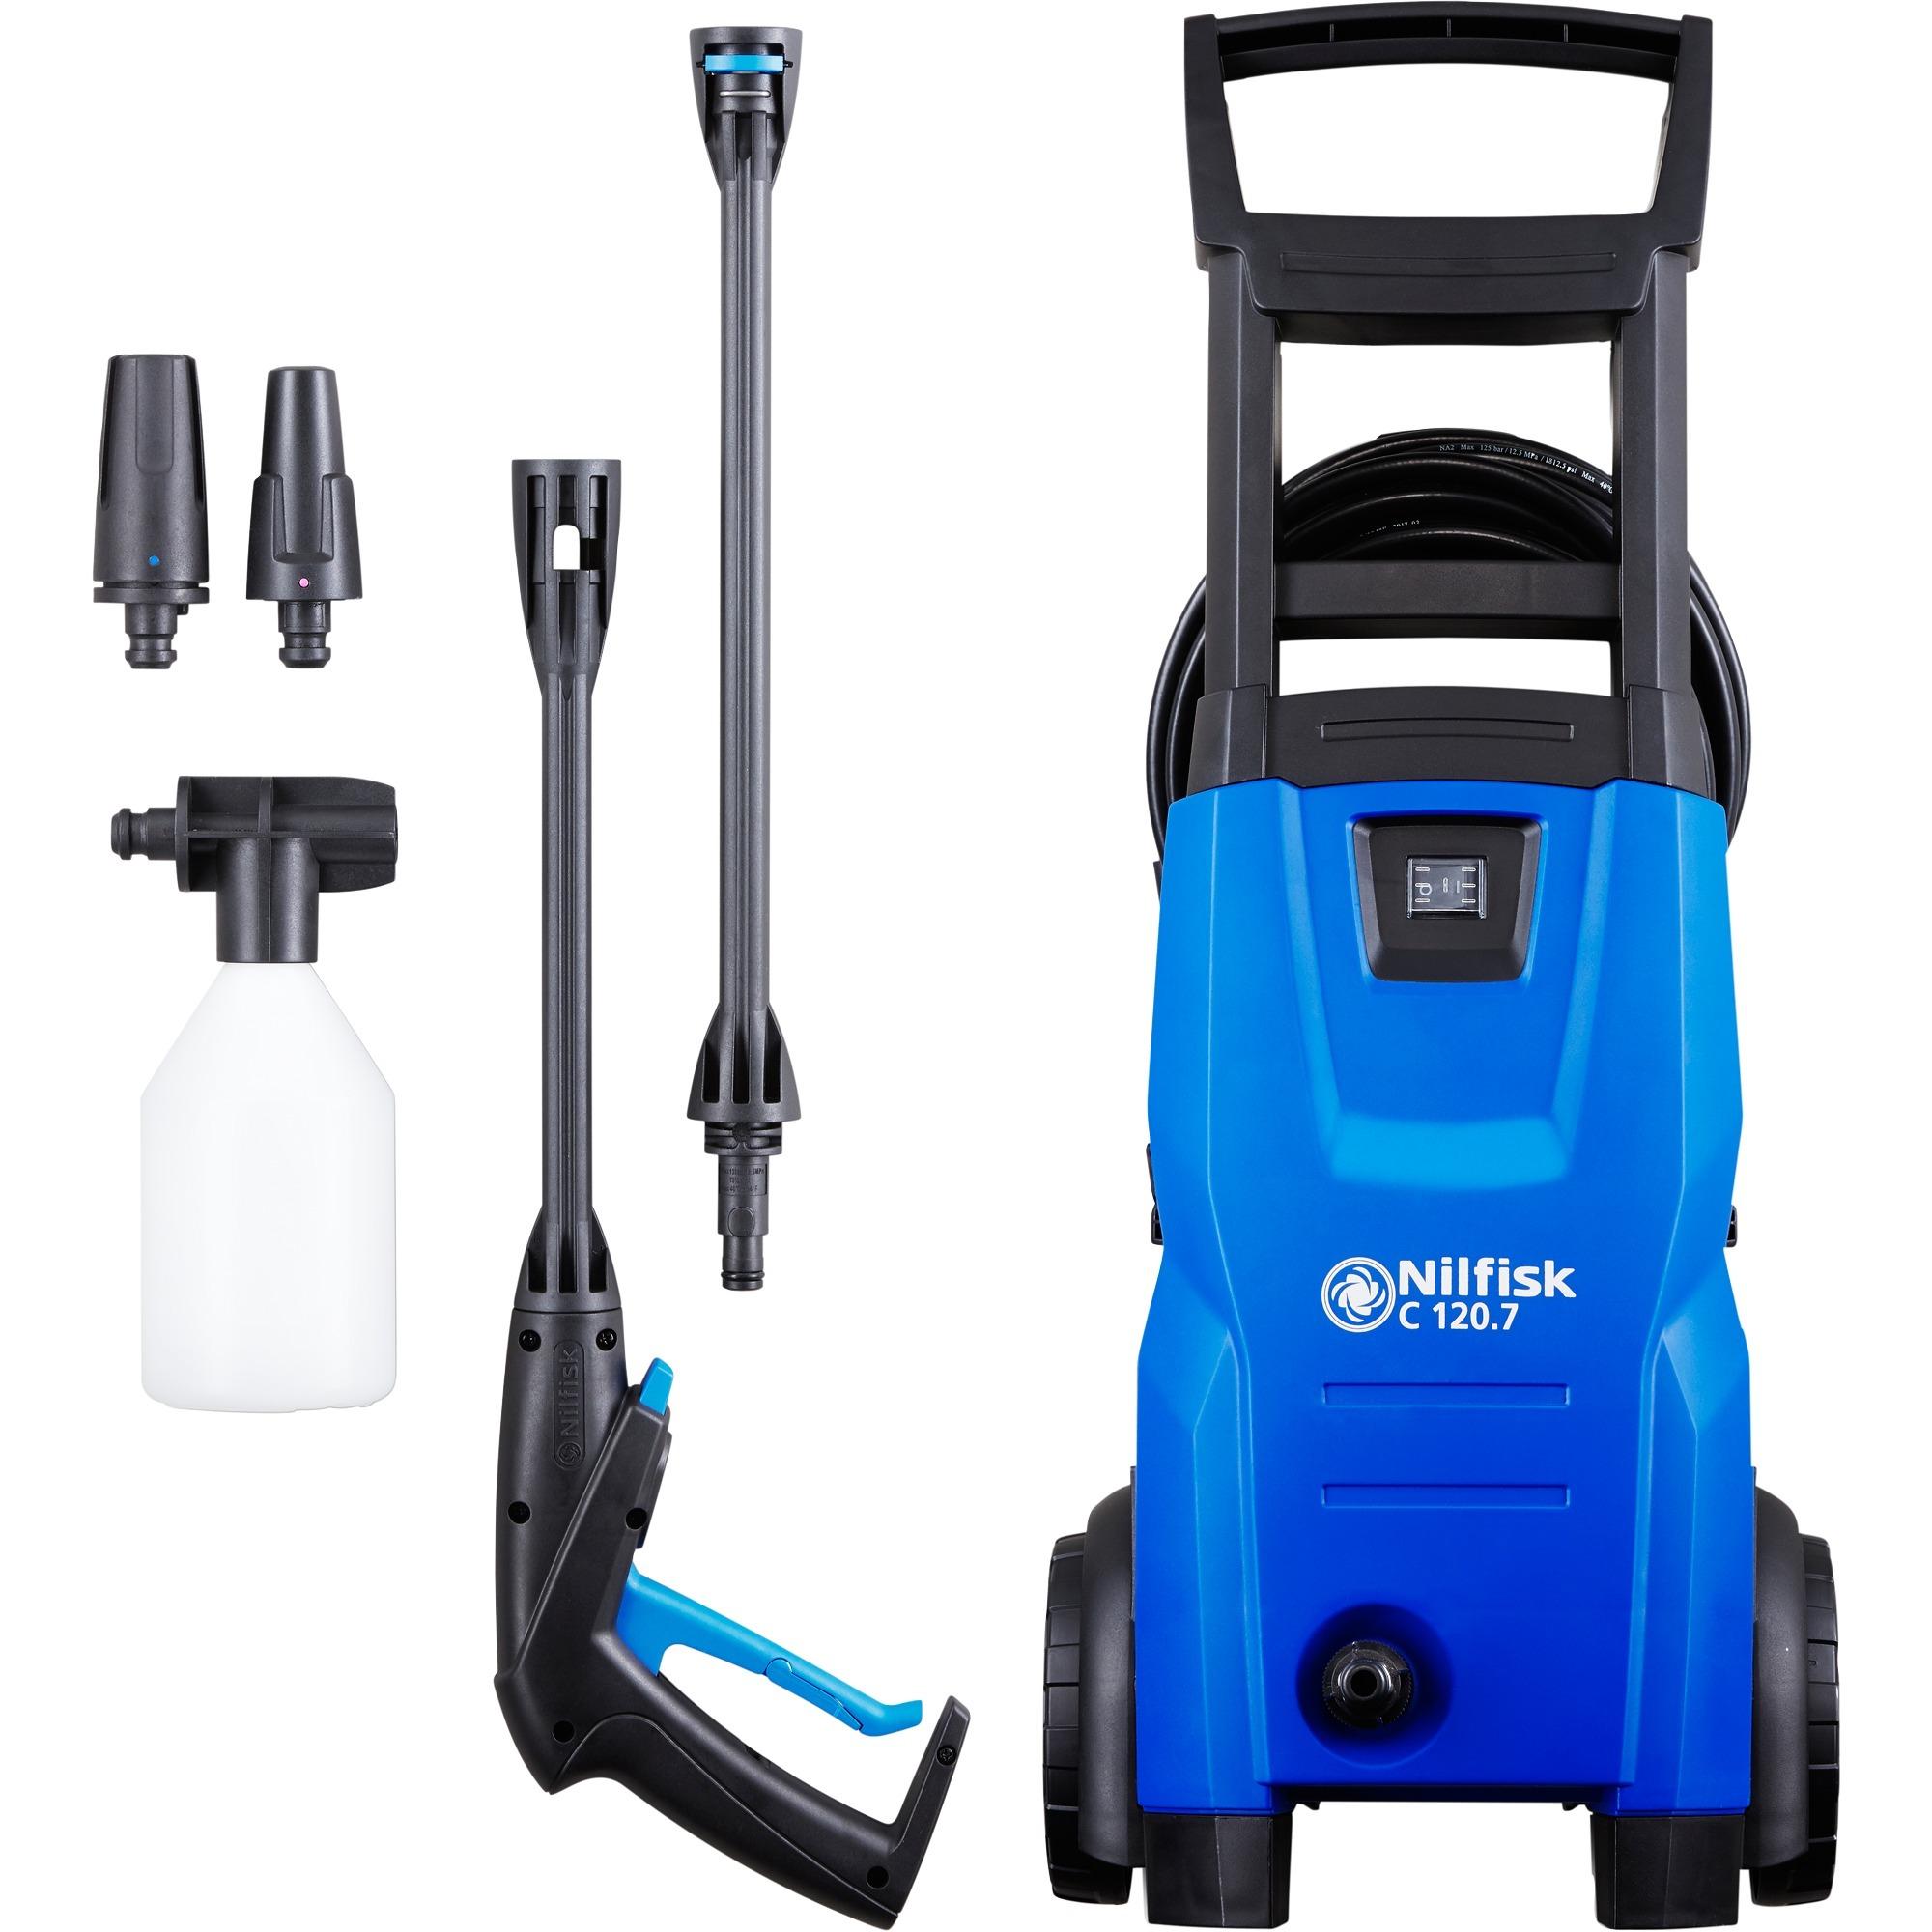 C 120.7-6 EU Limpiadora de alta presión o Hidrolimpiadora Vertical Eléctrico Negro, Azul 440 l/h 1400 W, Hidrolimpiadora de alta presión